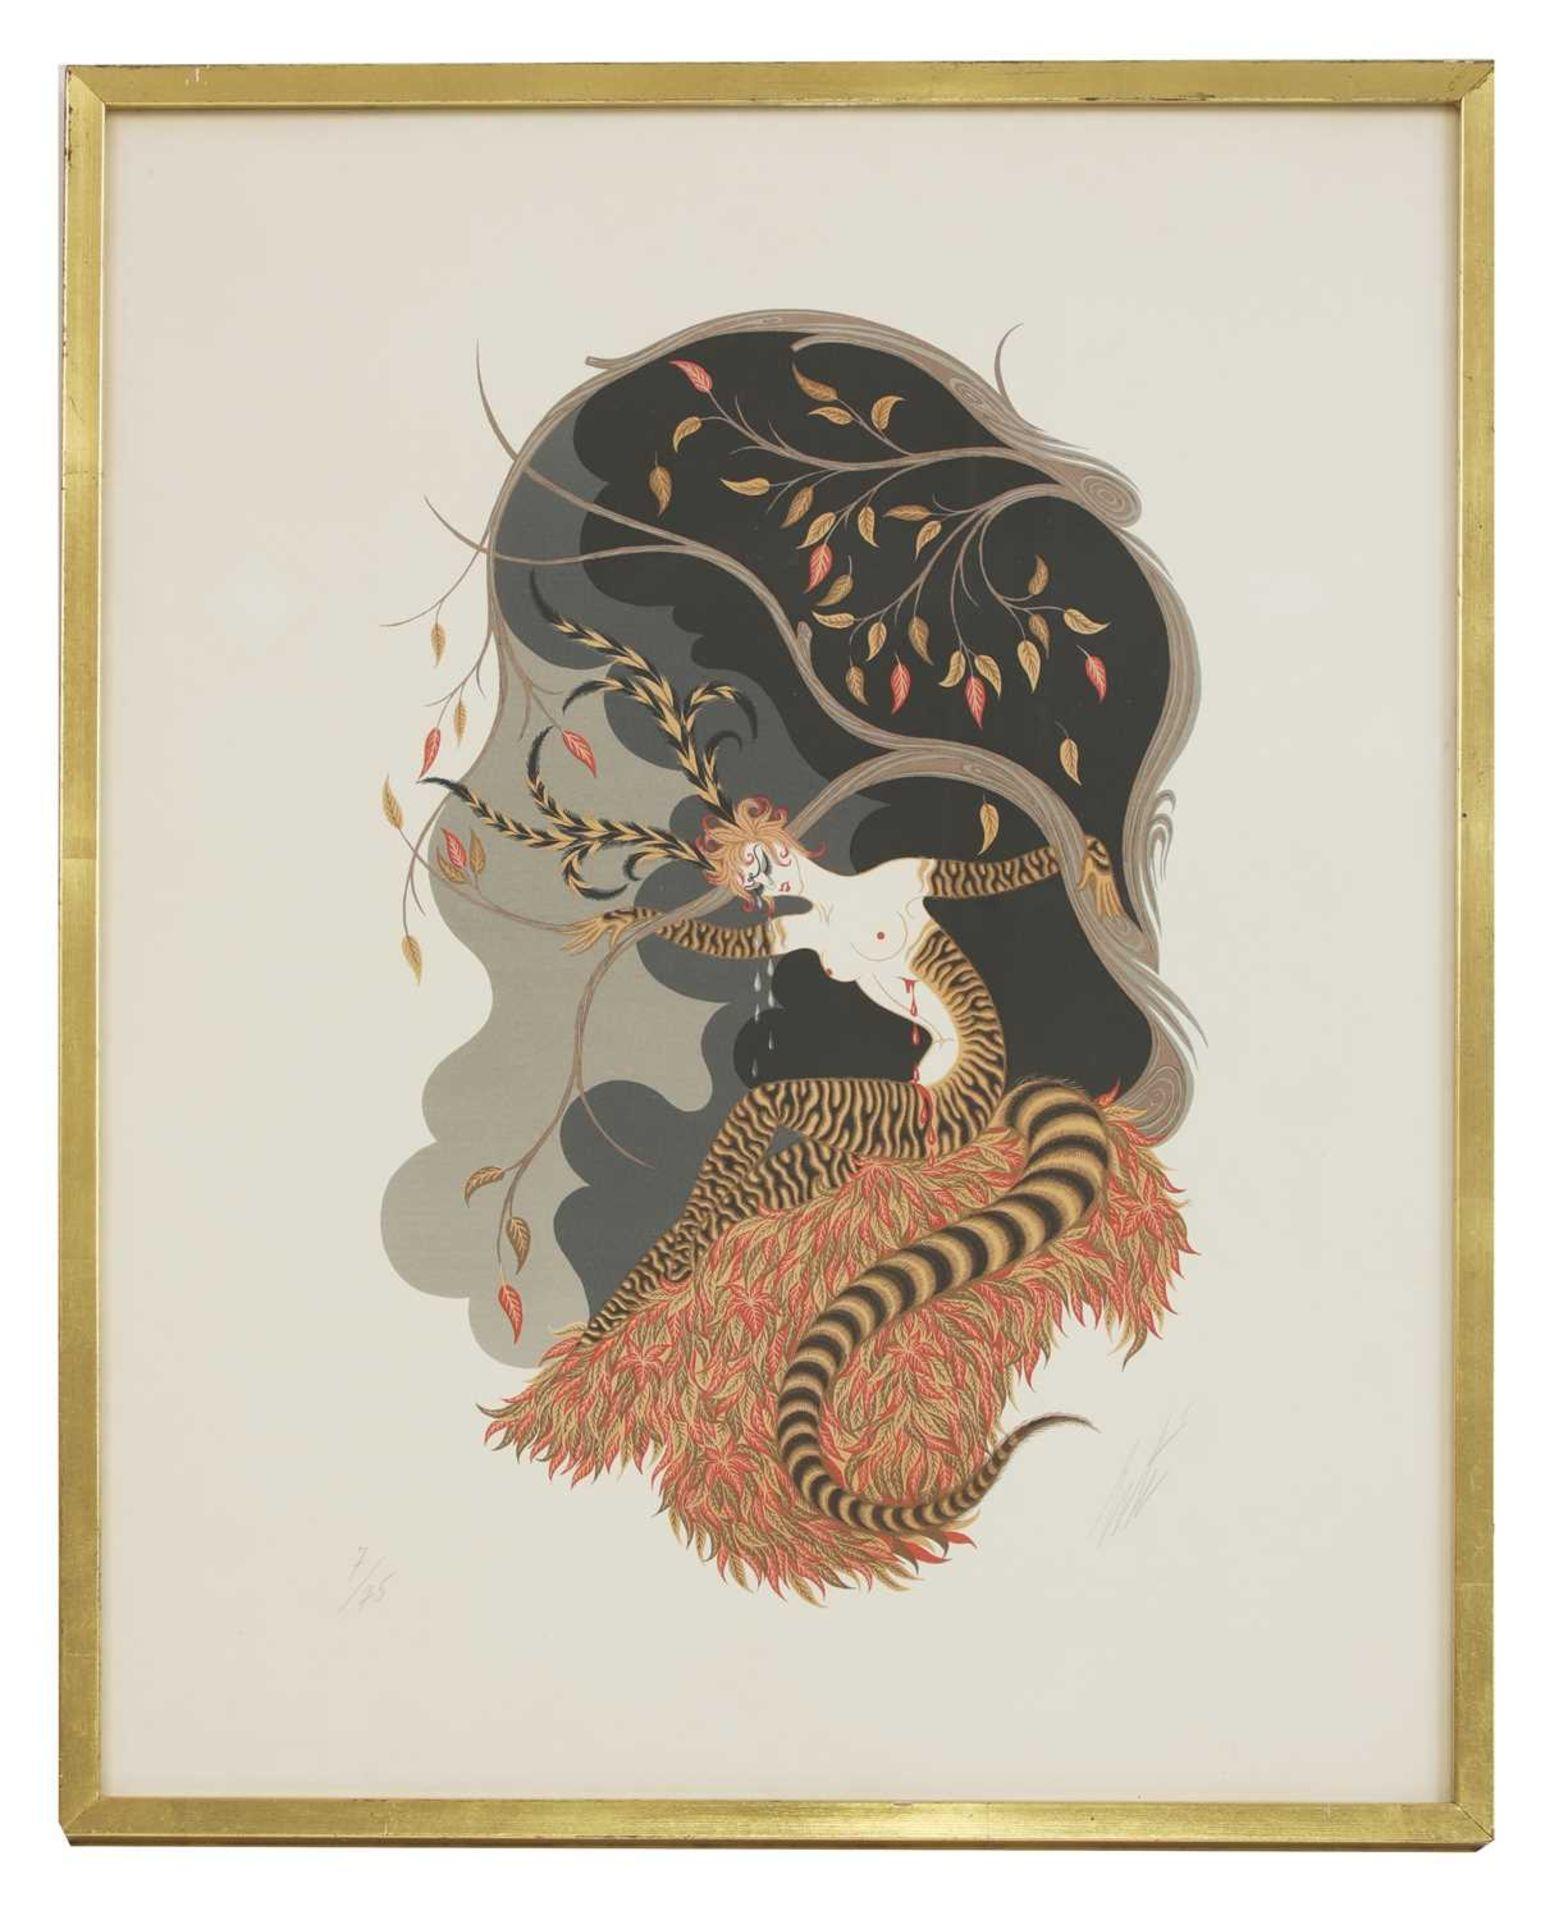 *'Erte' (Romain de Tirtoff) (Russian-French, 1892-1990) - Image 3 of 4